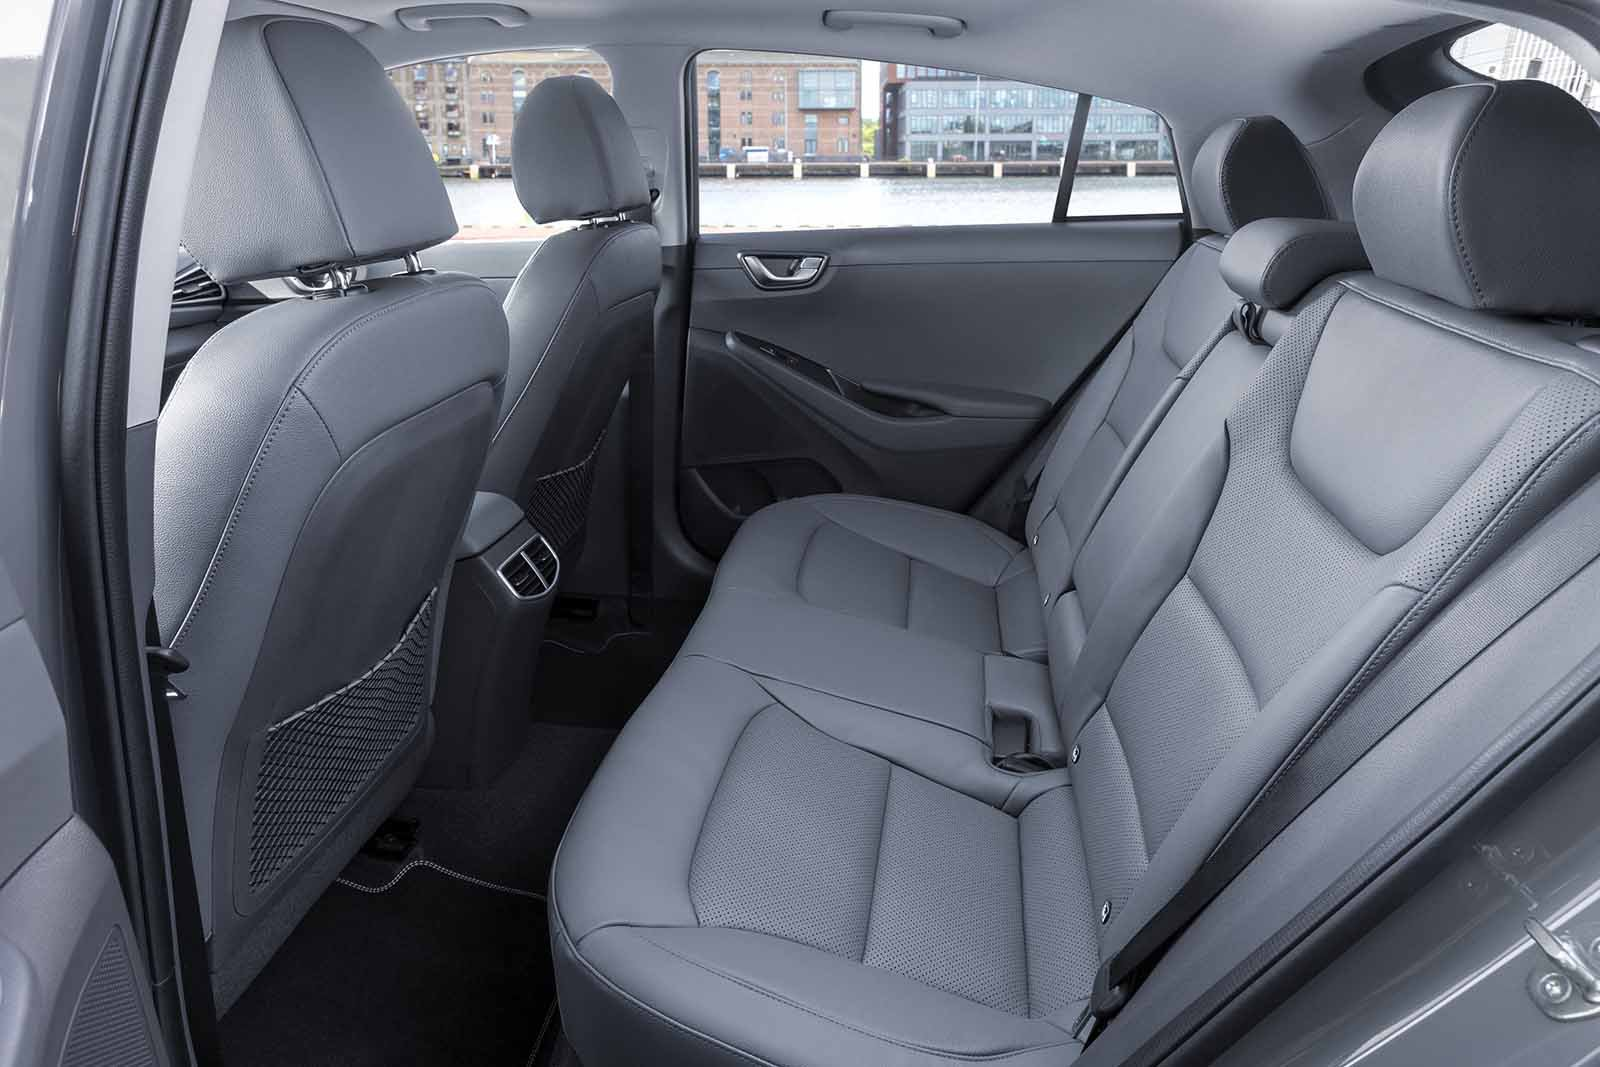 Hyundai Ioniq Hybrid 2019 rear seat